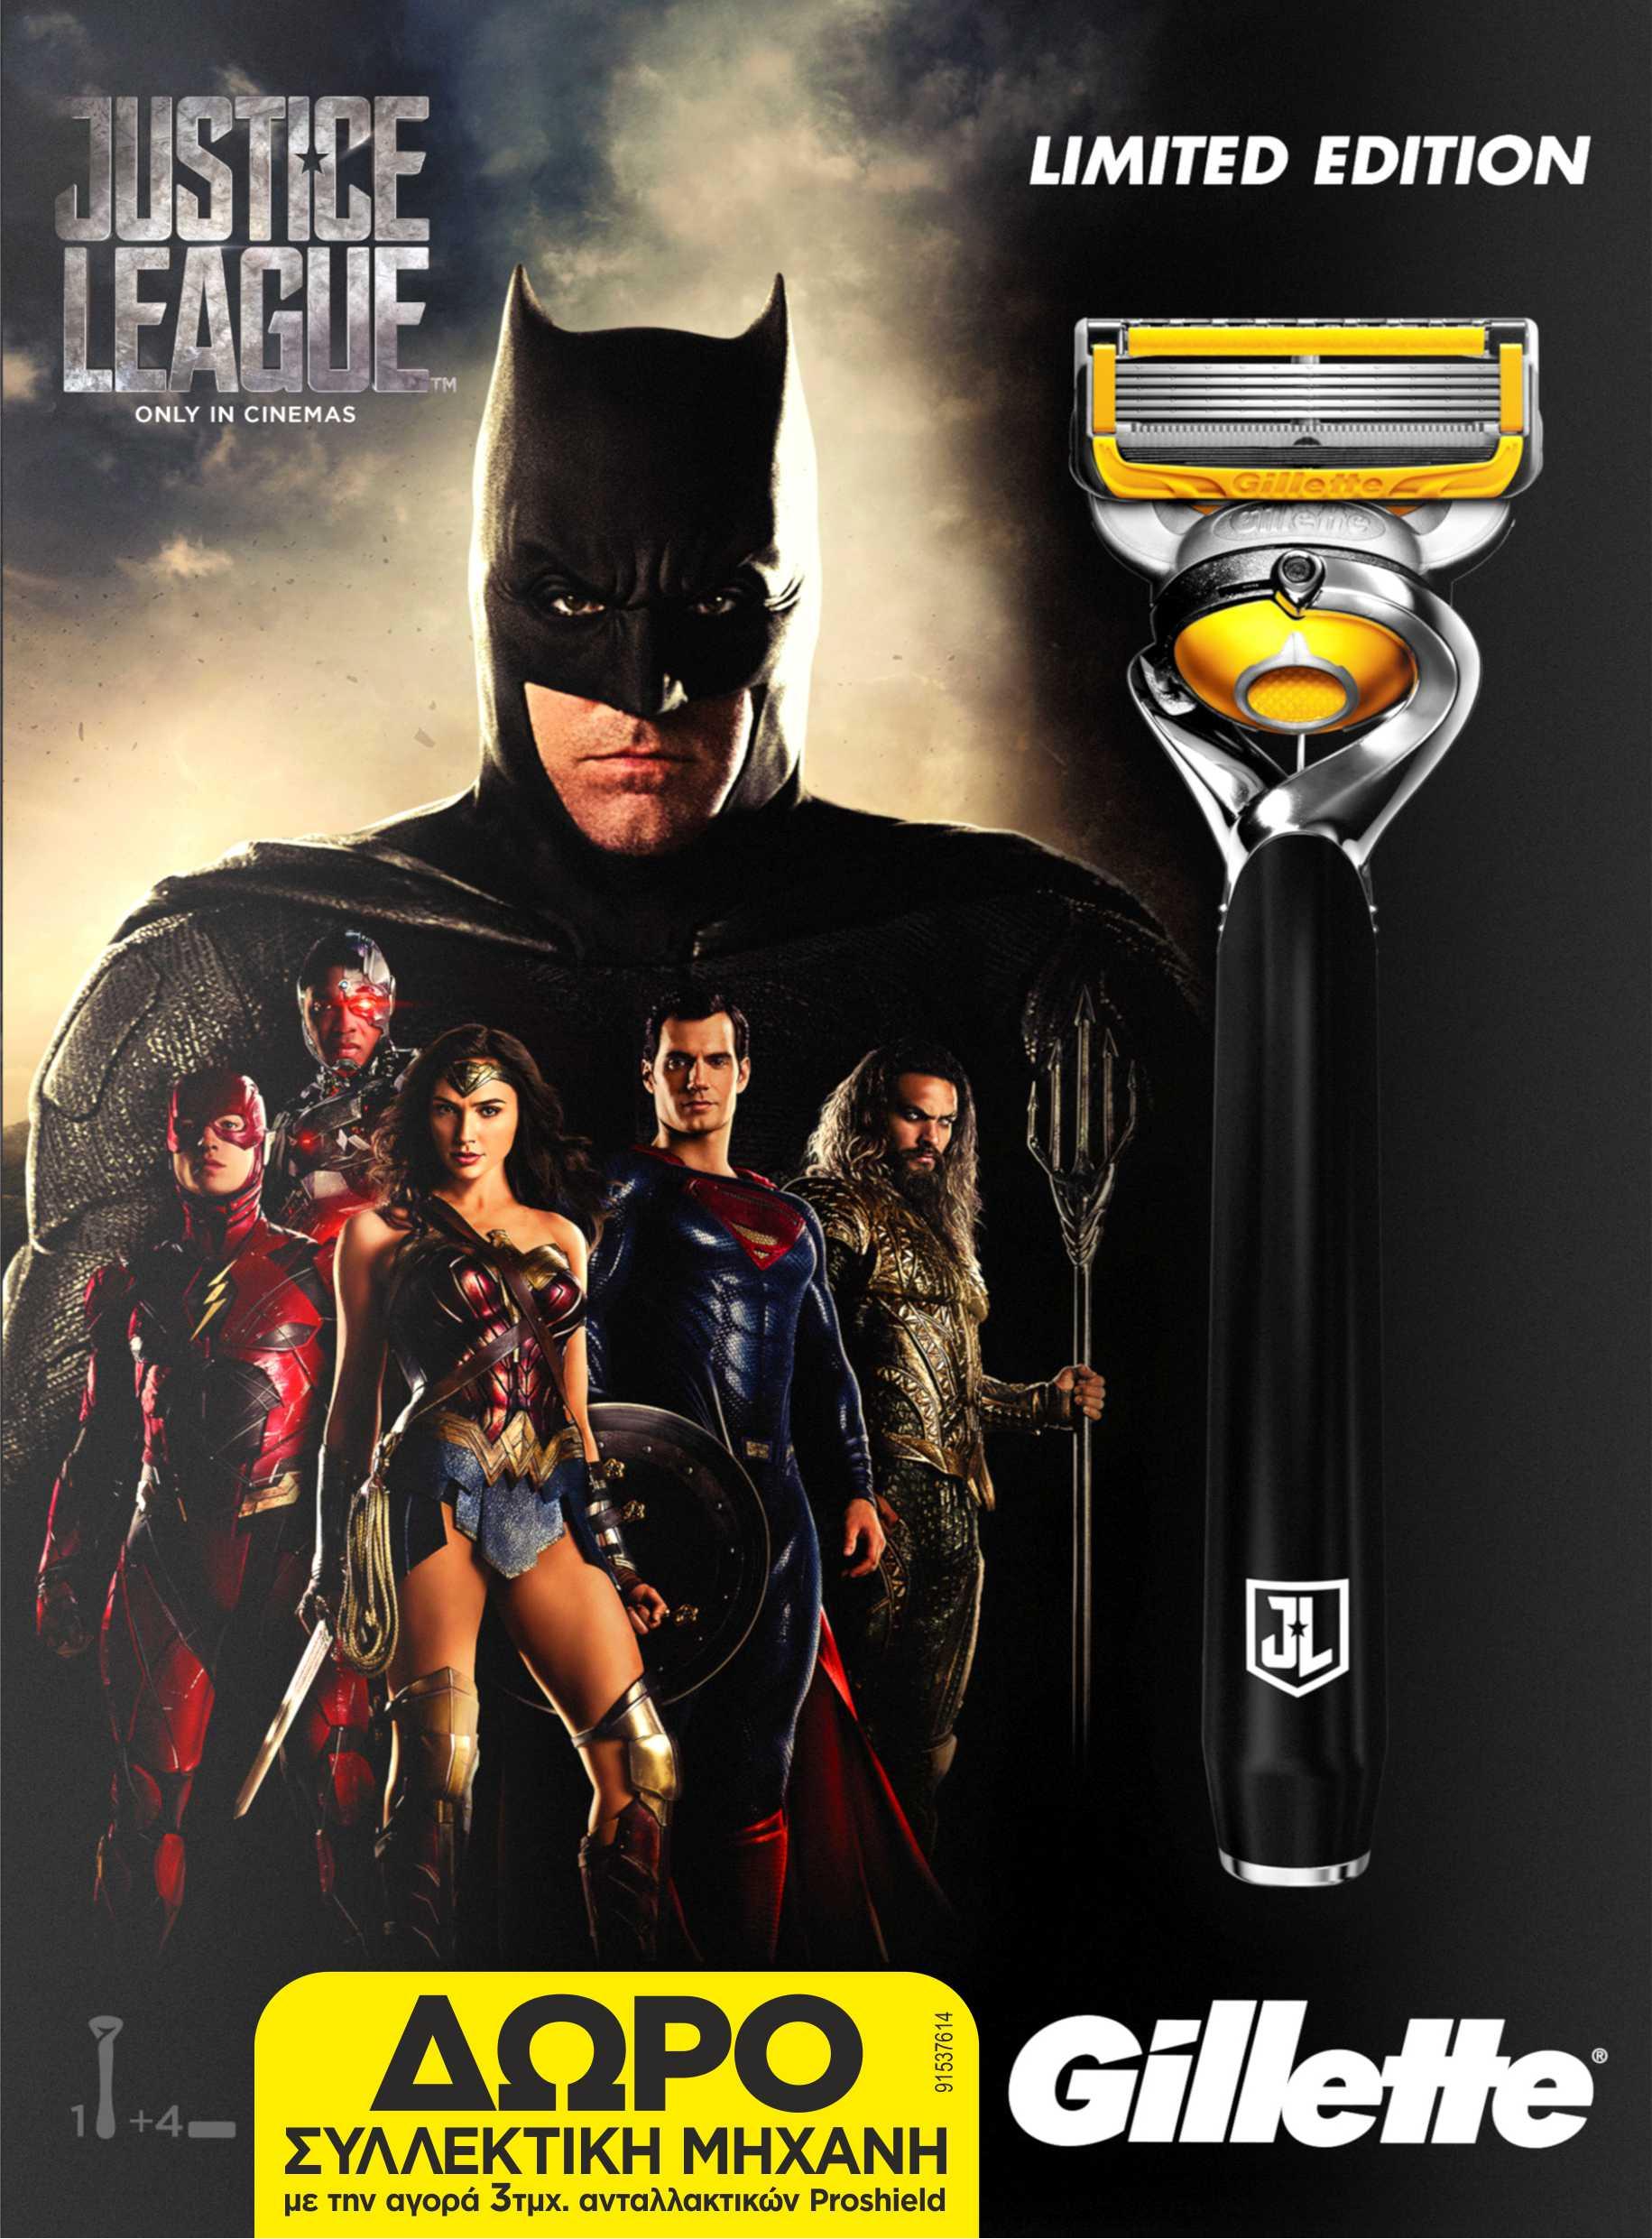 Gillette Justice League Special Edition Fusion ProShield Σετ Δώρου με Fusion Proshield Ξυριστική Μηχανή με τεχνολογία Flexball, 1 τεμάχιο & 3 Ανταλλακτικά